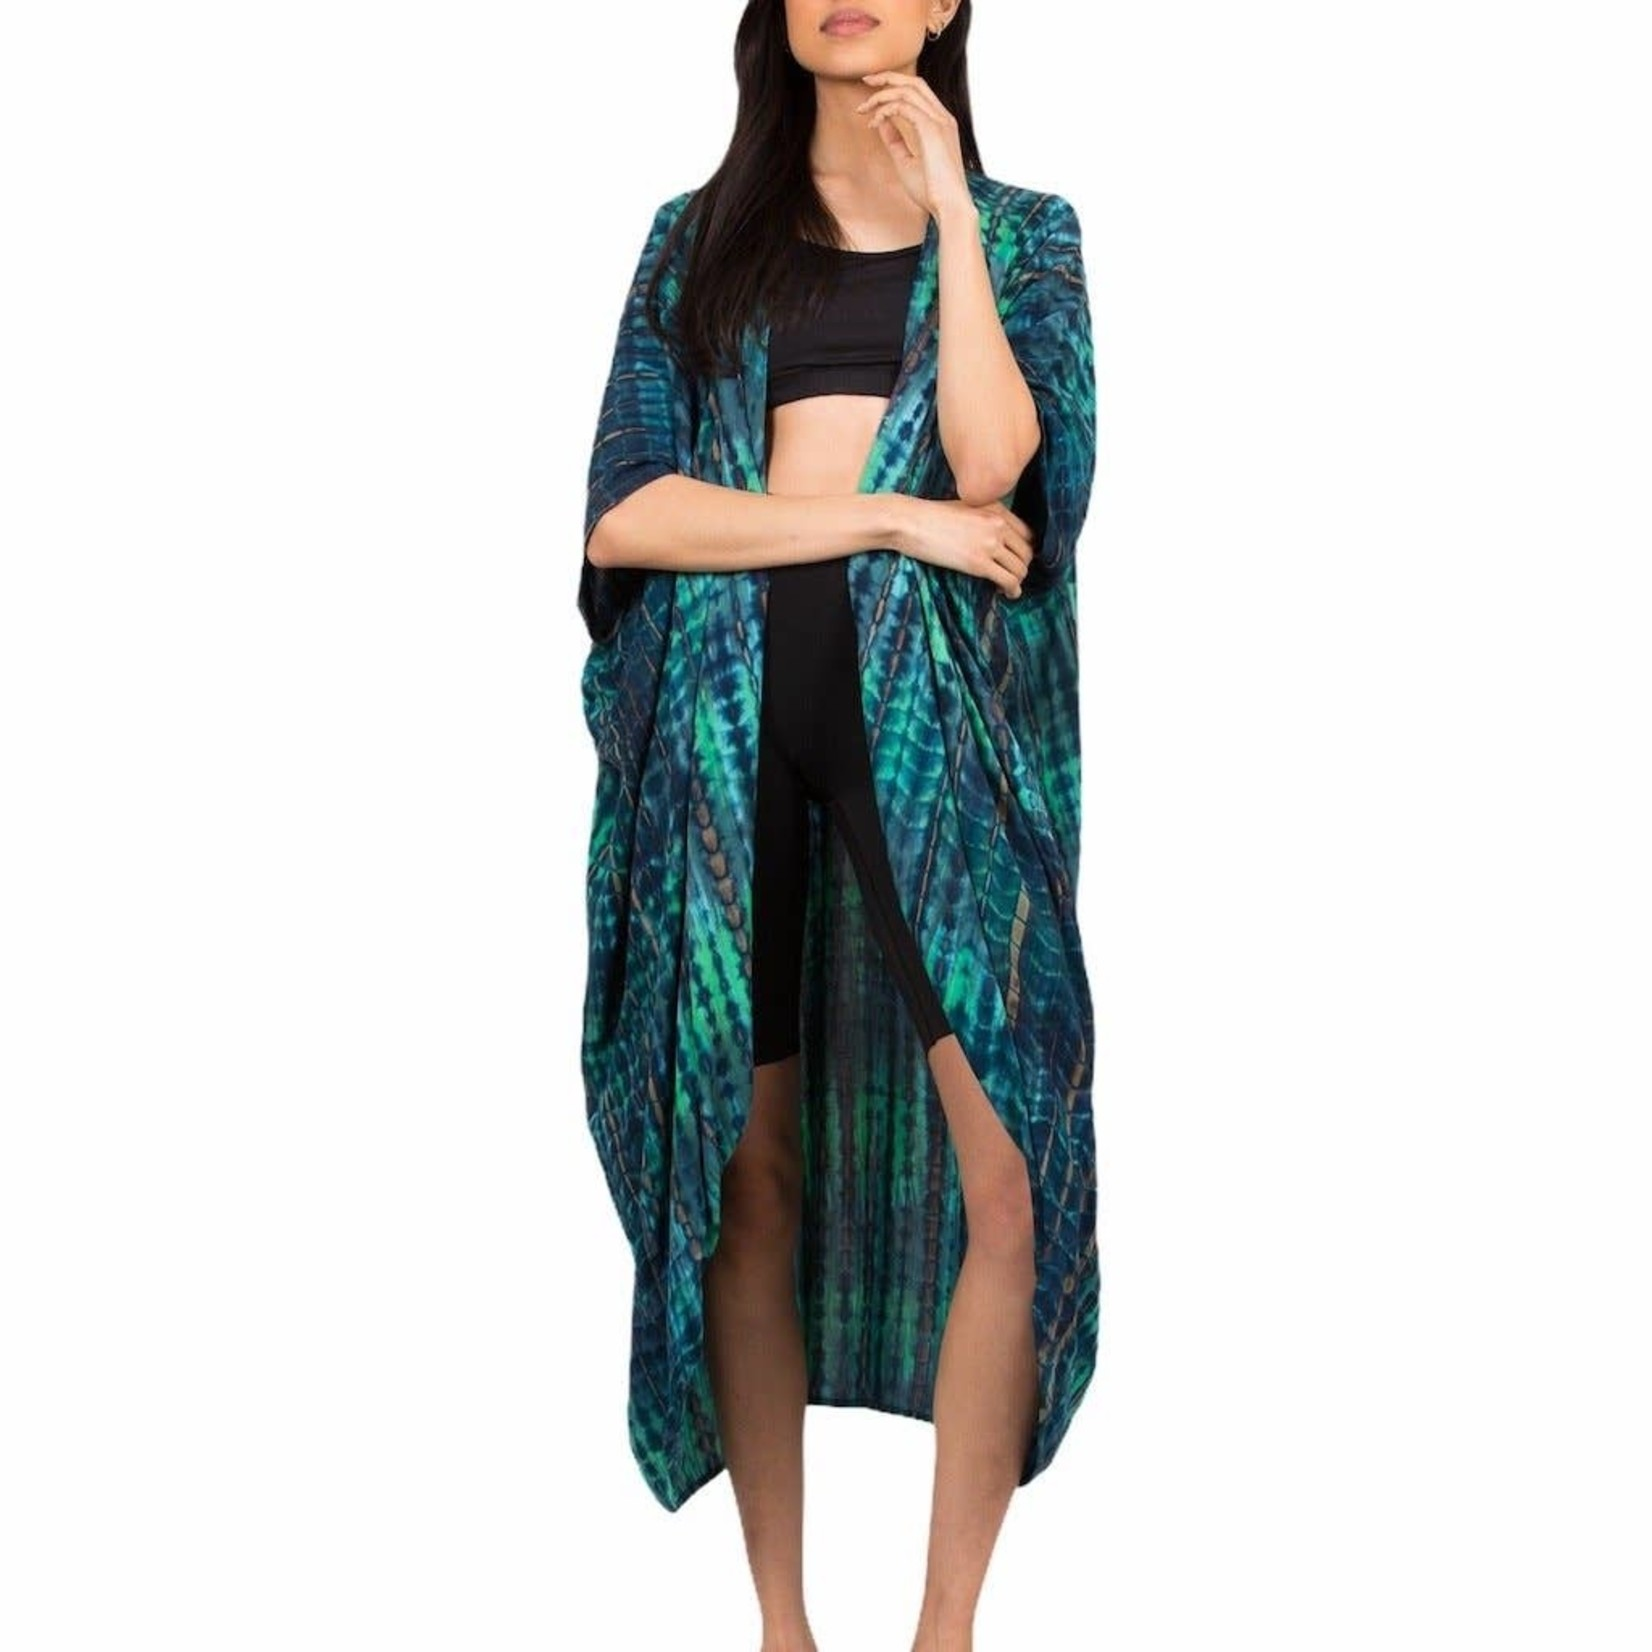 Suzie Blue Canada Green and Blue Tie Dye Print Kimono